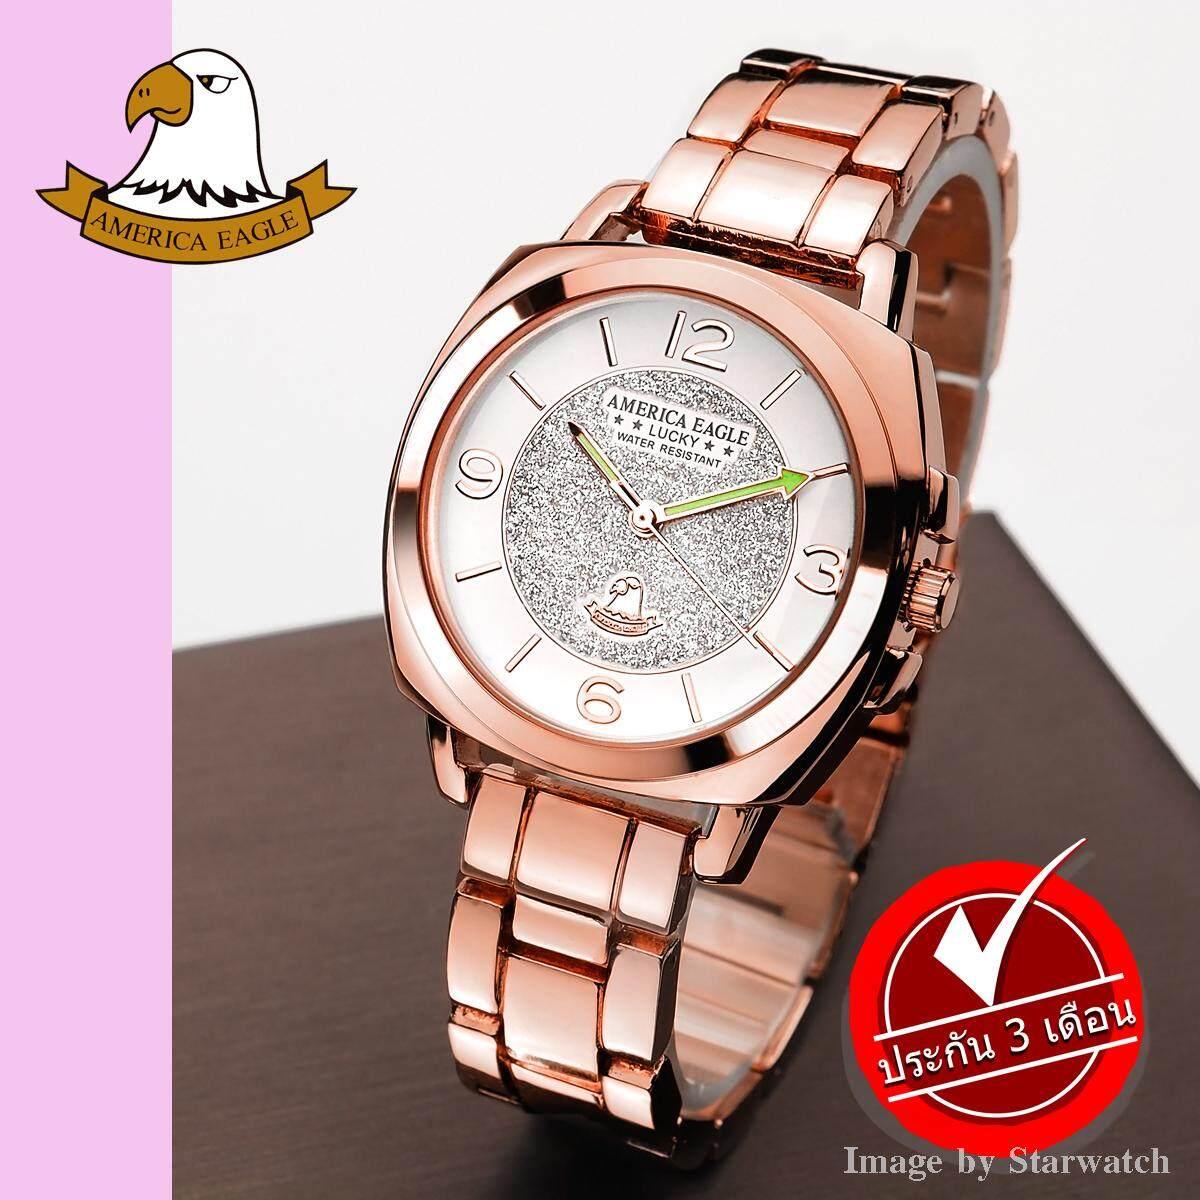 AMERICA EAGLE นาฬิกาข้อมือผู้หญิง สายสแตนเลส รุ่น AE003L - PinkGold /White